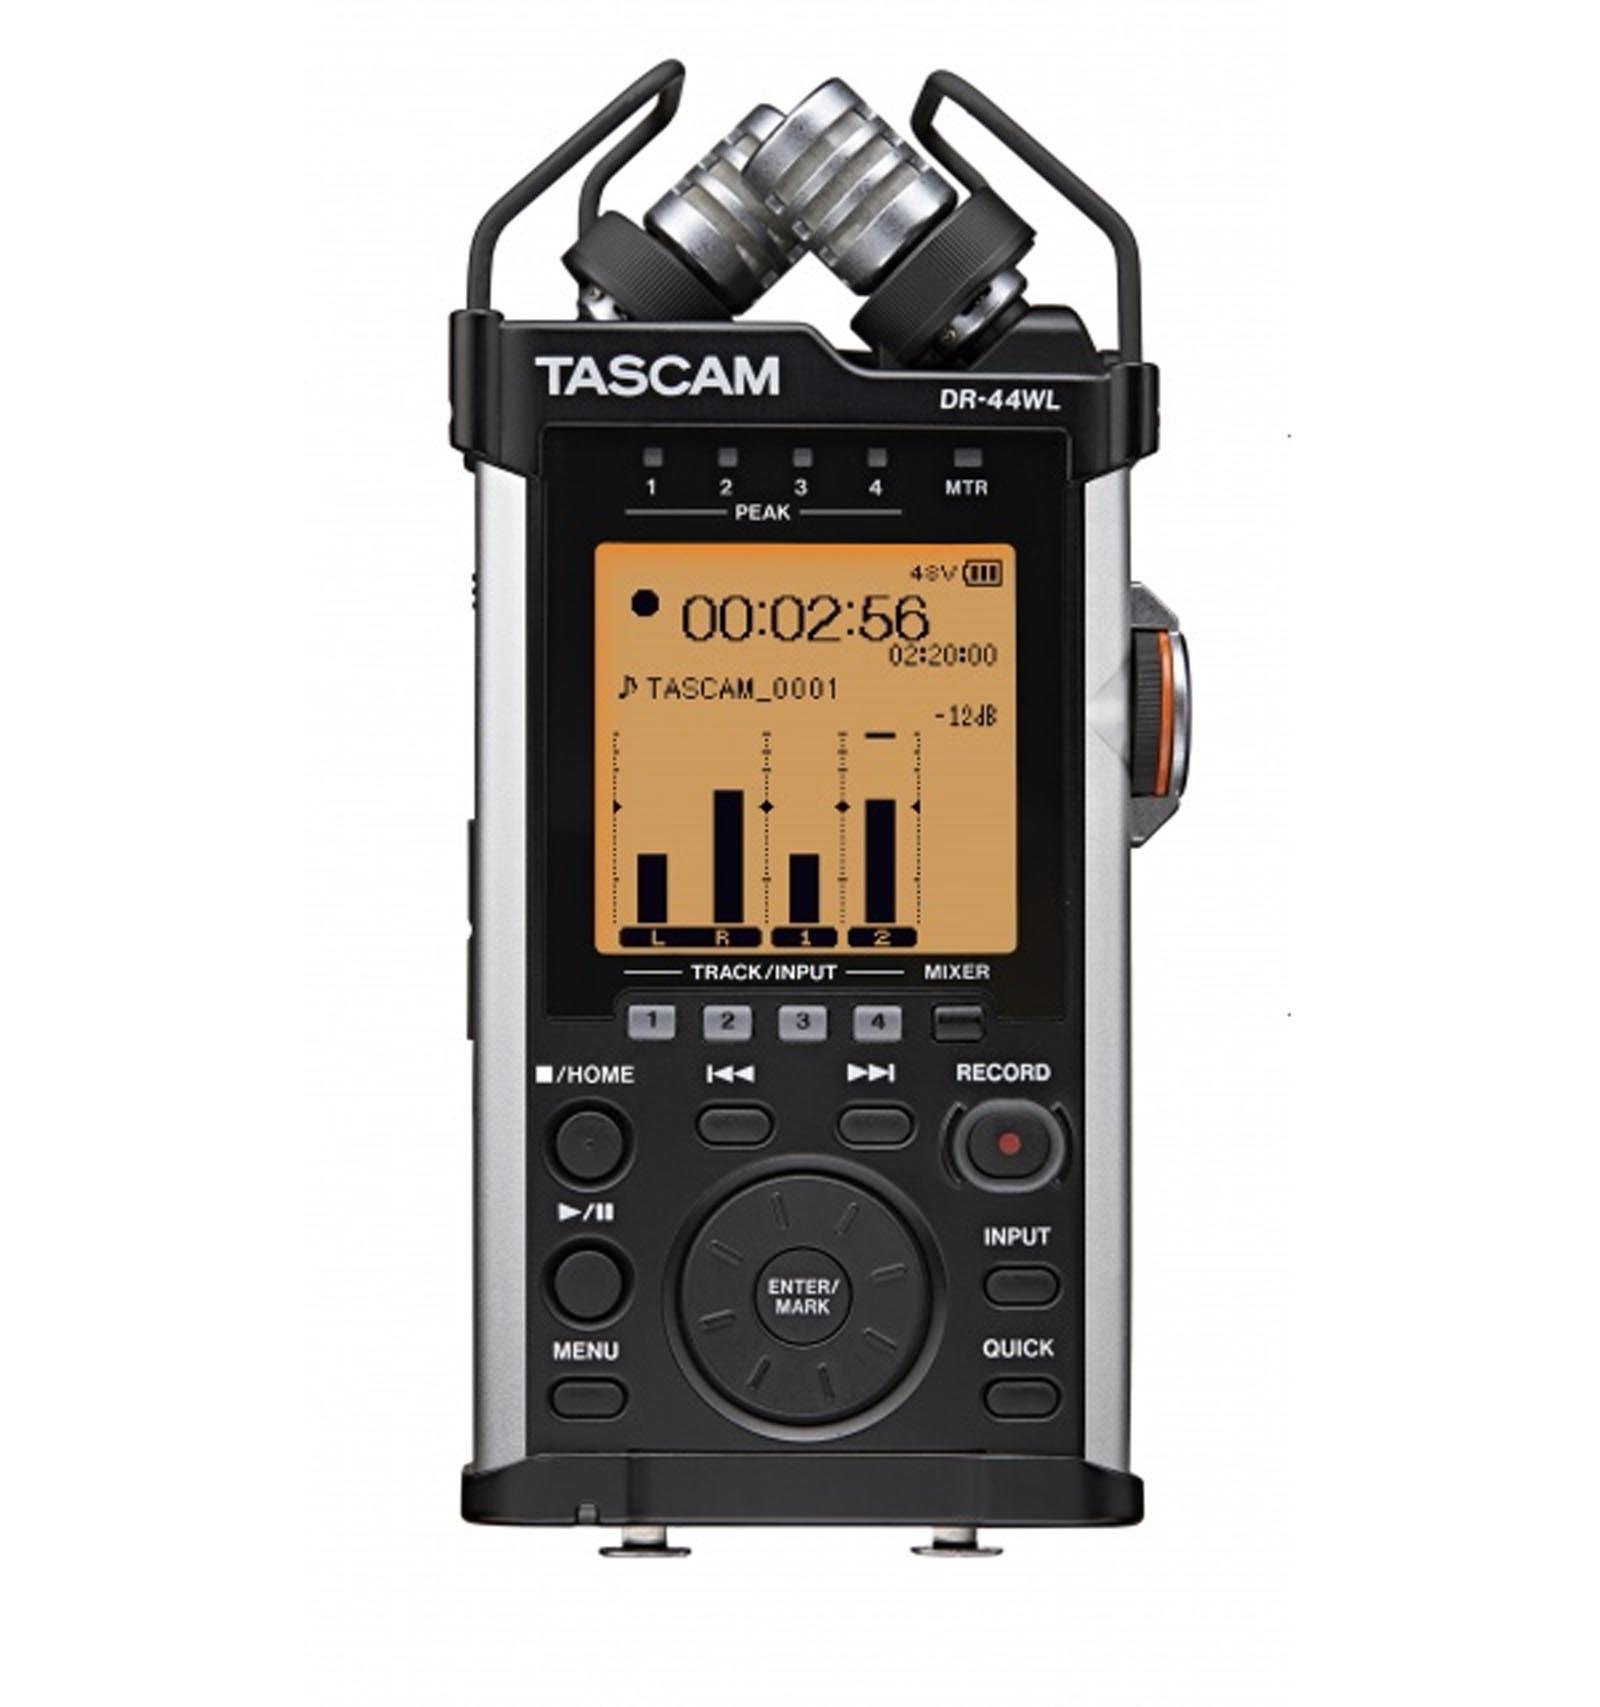 Refurb! TASCAM DR-44WL 4-Ch Handheld Portable Linear PCM Audio Recorder w/ Wi-Fi